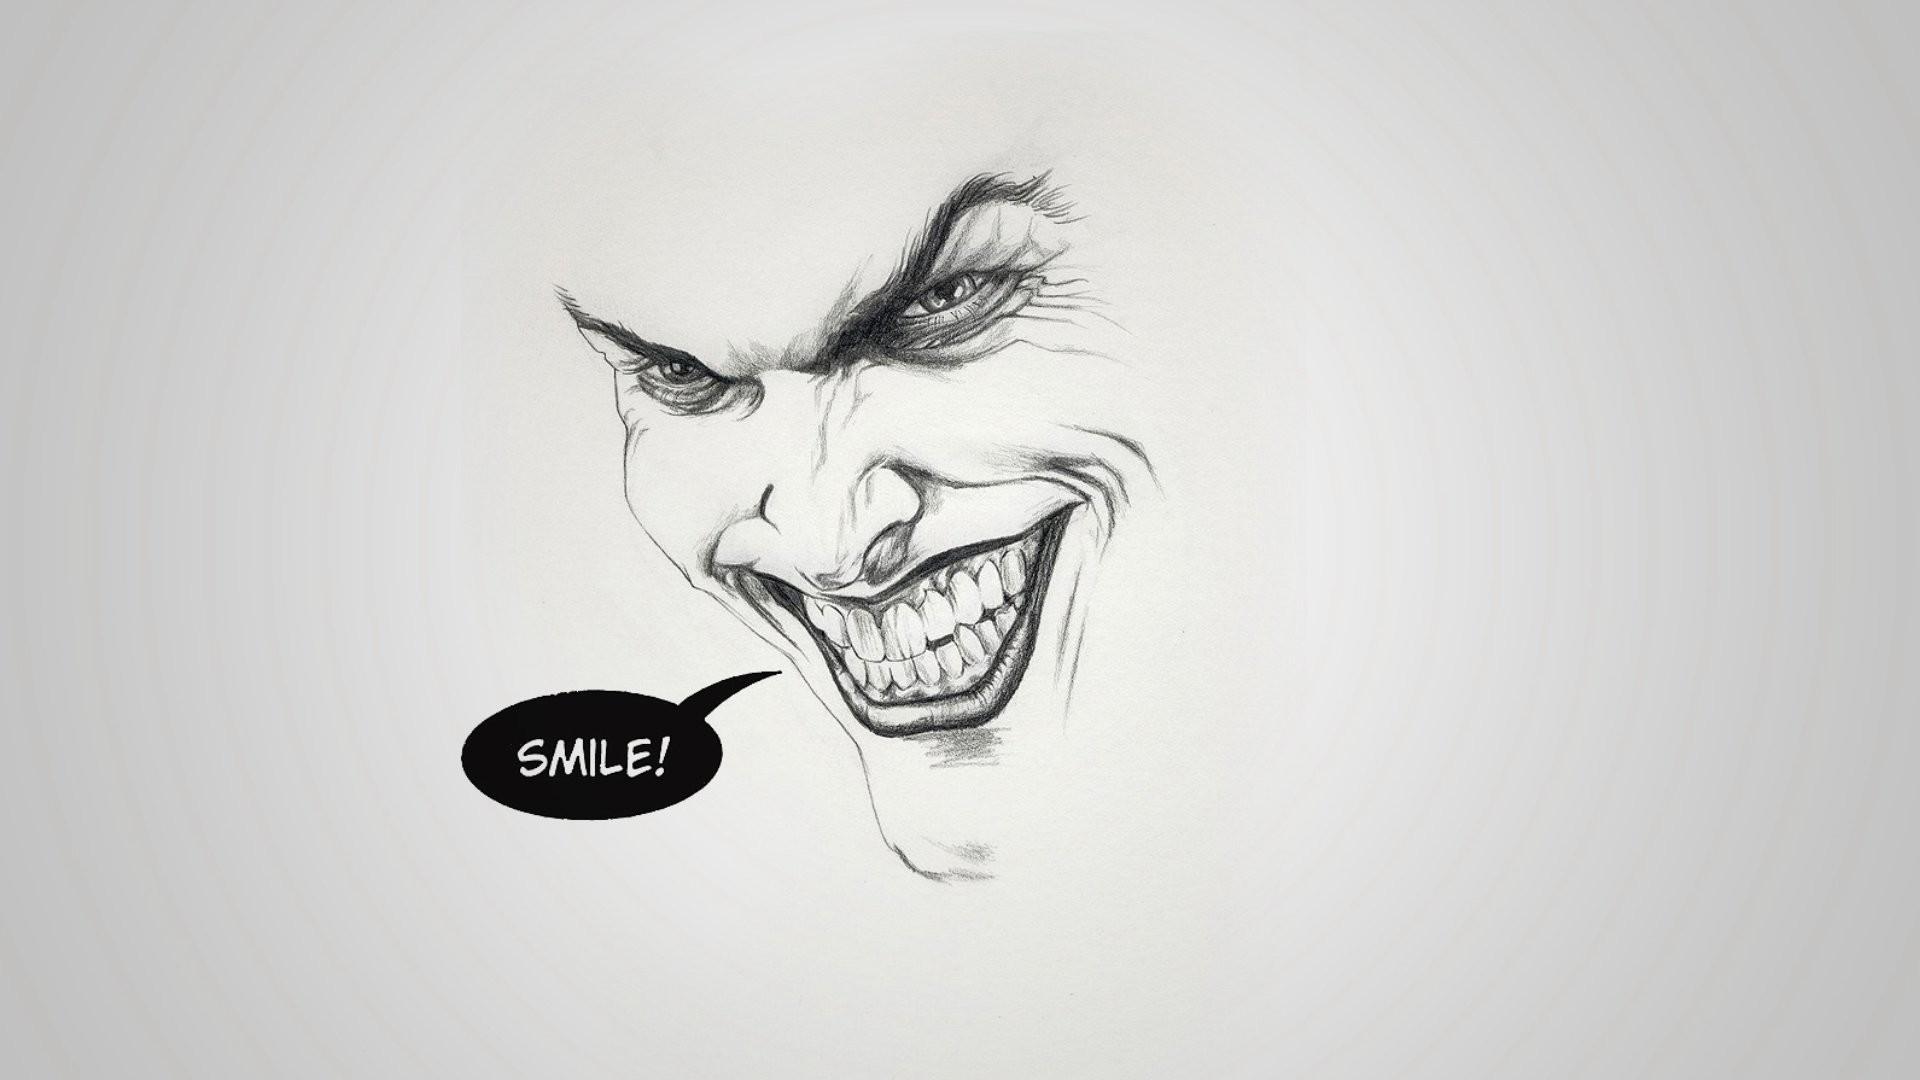 Joker HD Wallpaper 1